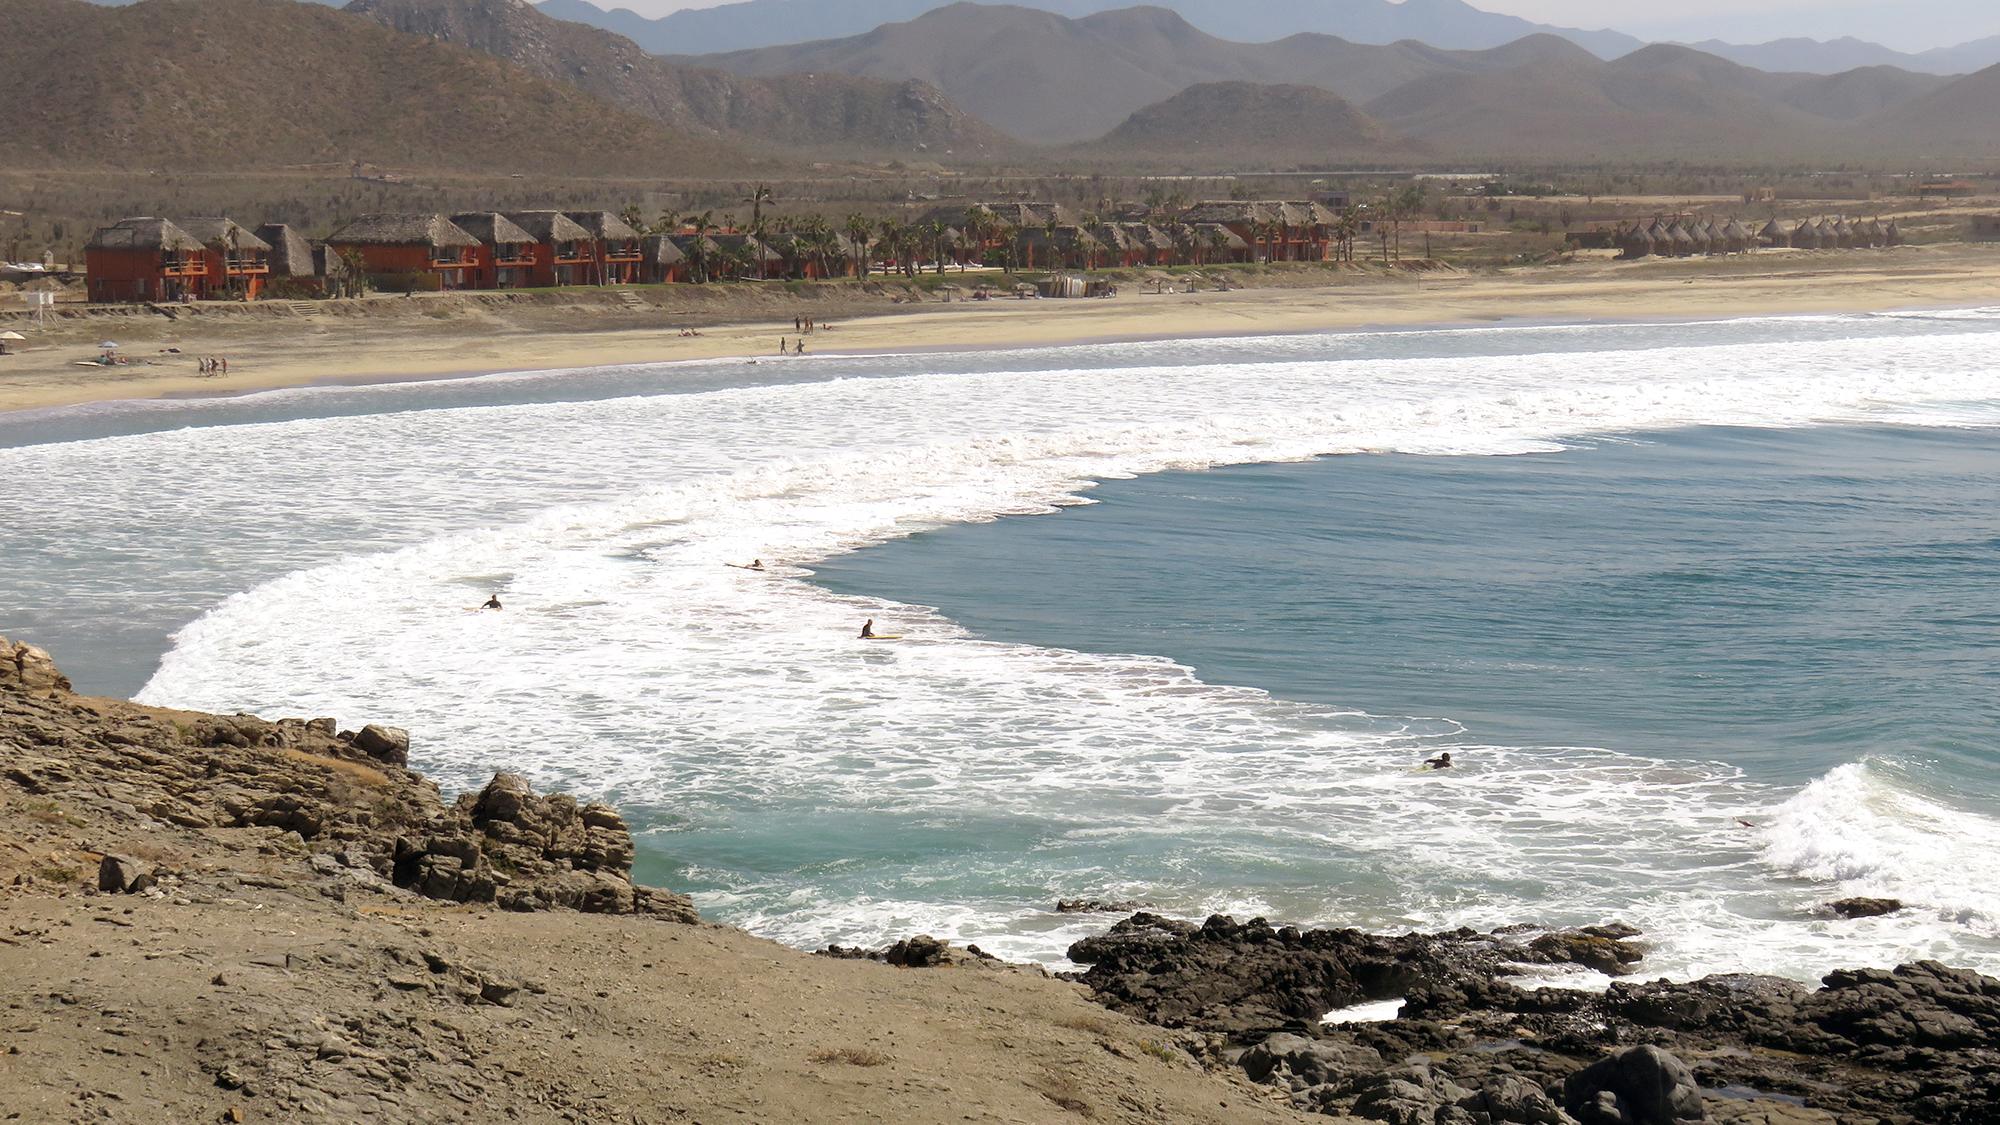 Where the locals go: Los Cabos